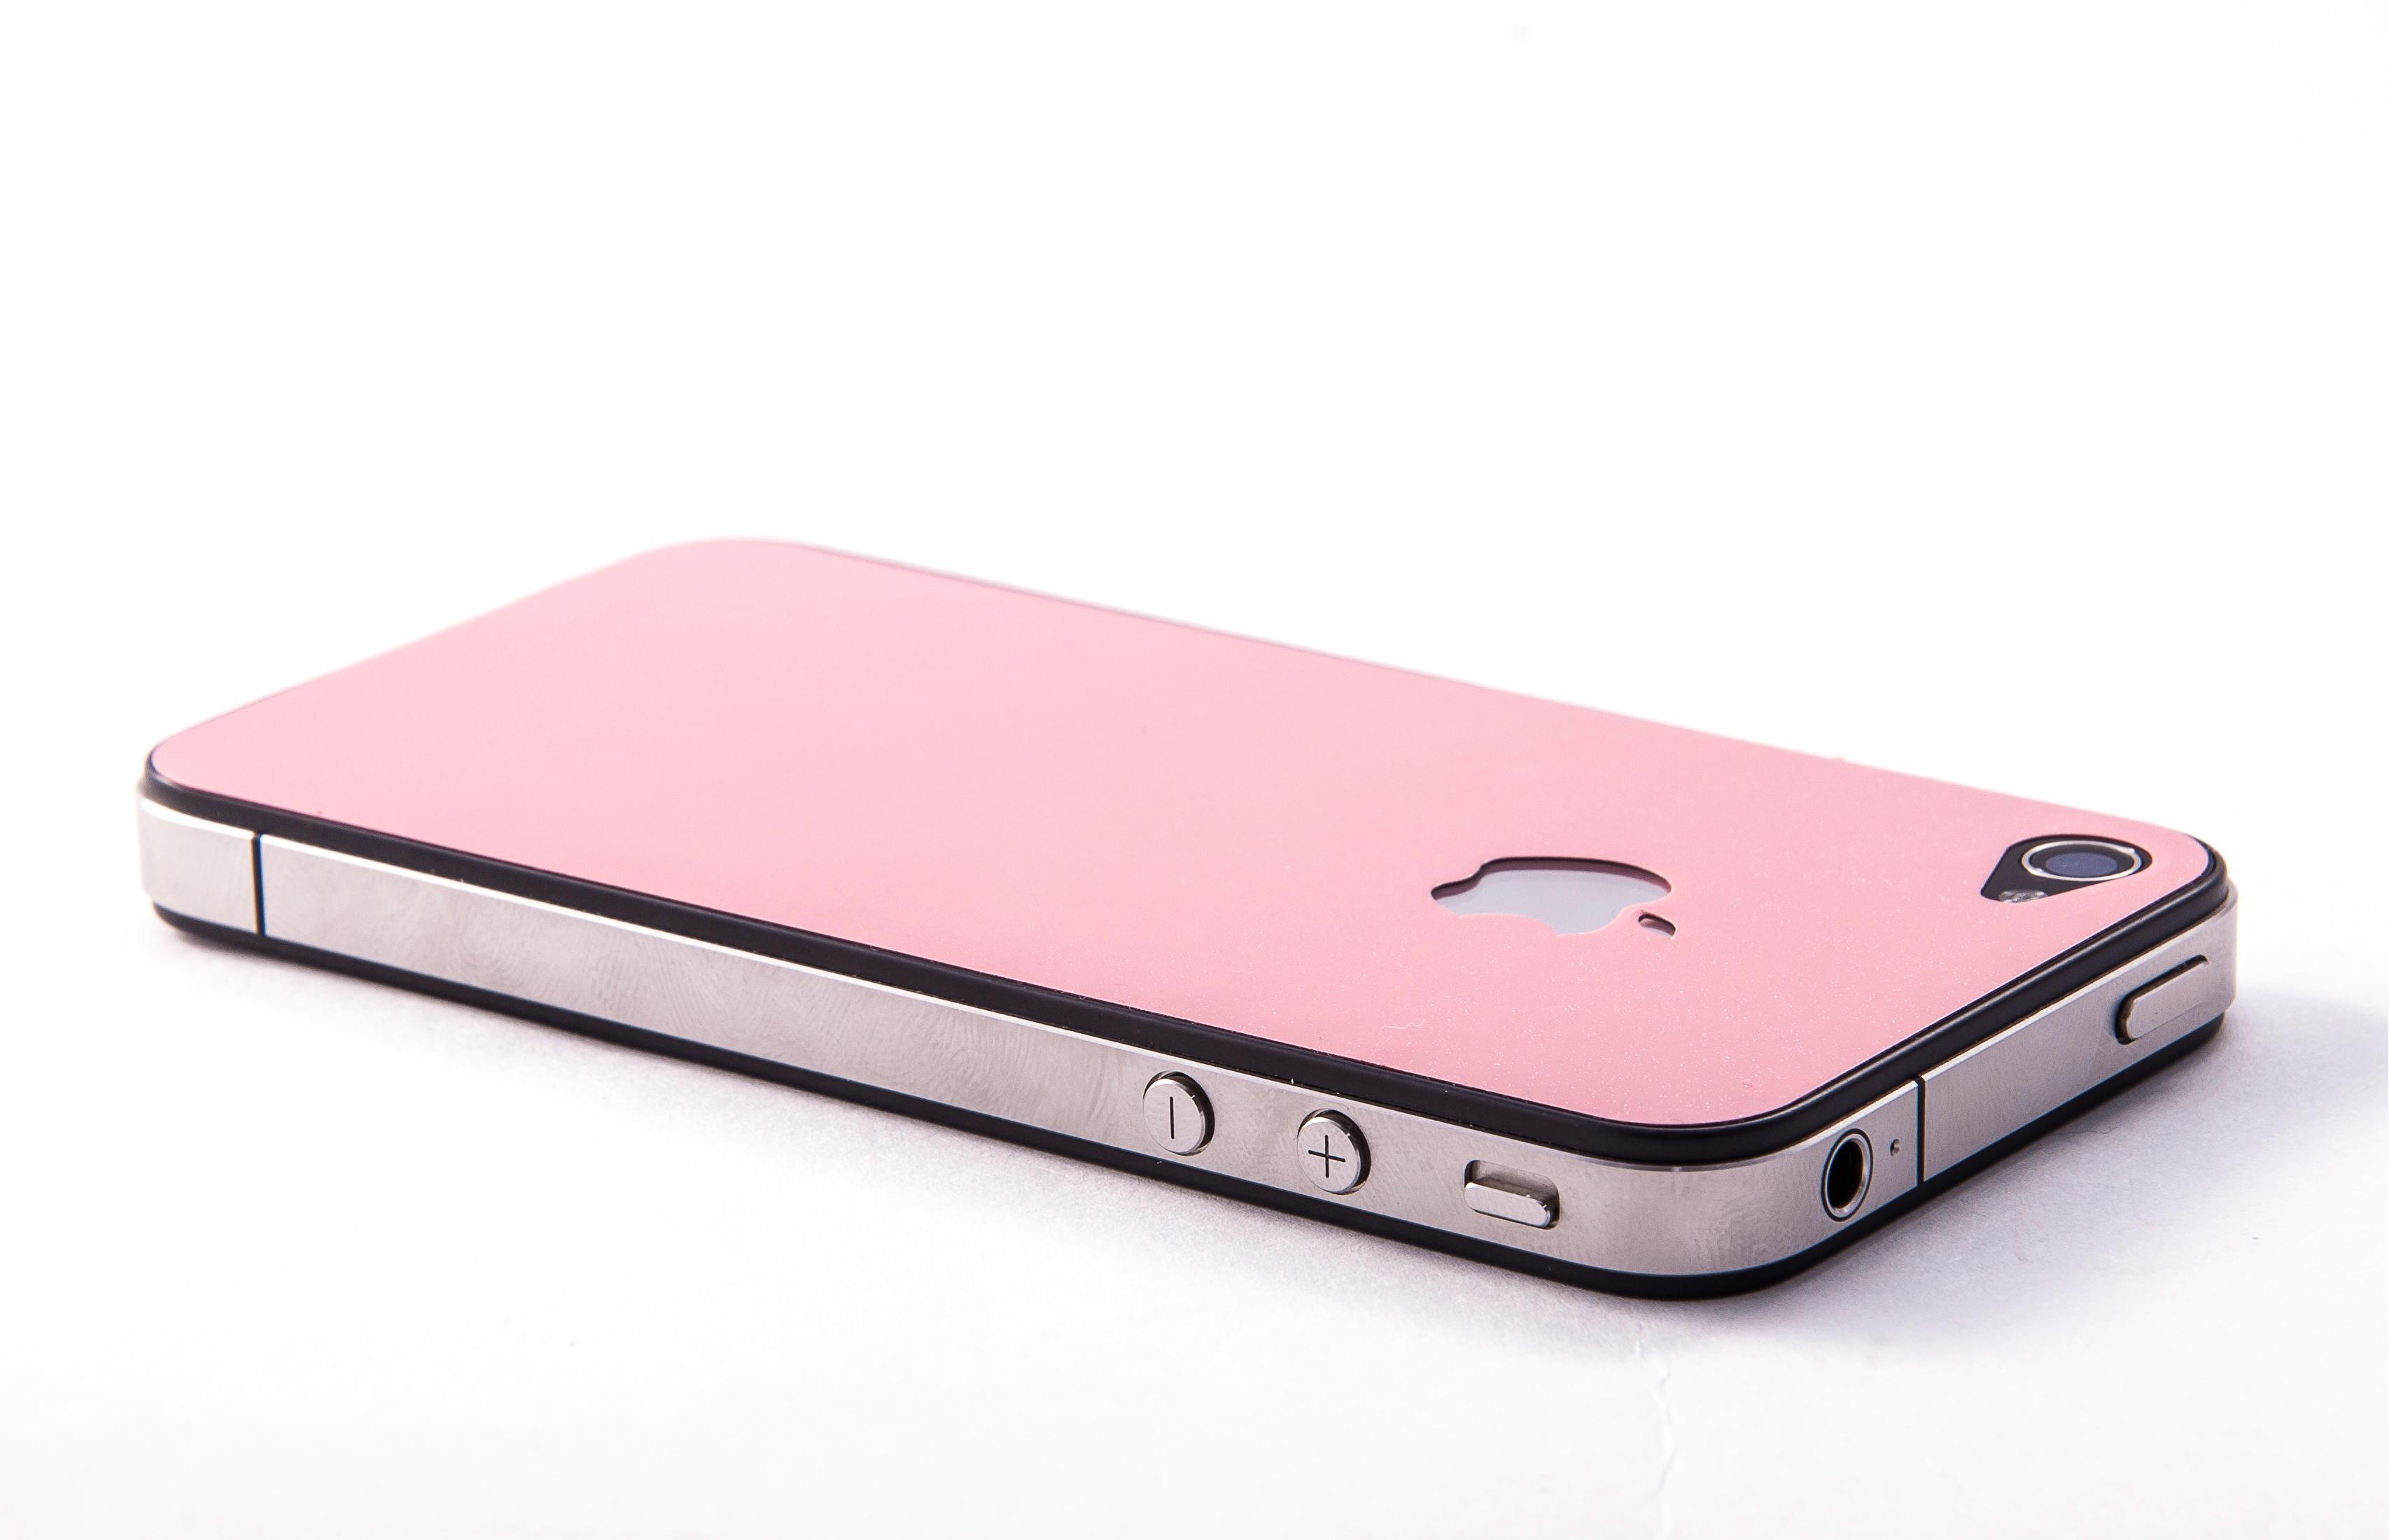 Пленка защитная EGGO iPhone 4/4S Crystalcover pink BackSide (розовая, перламутровая)